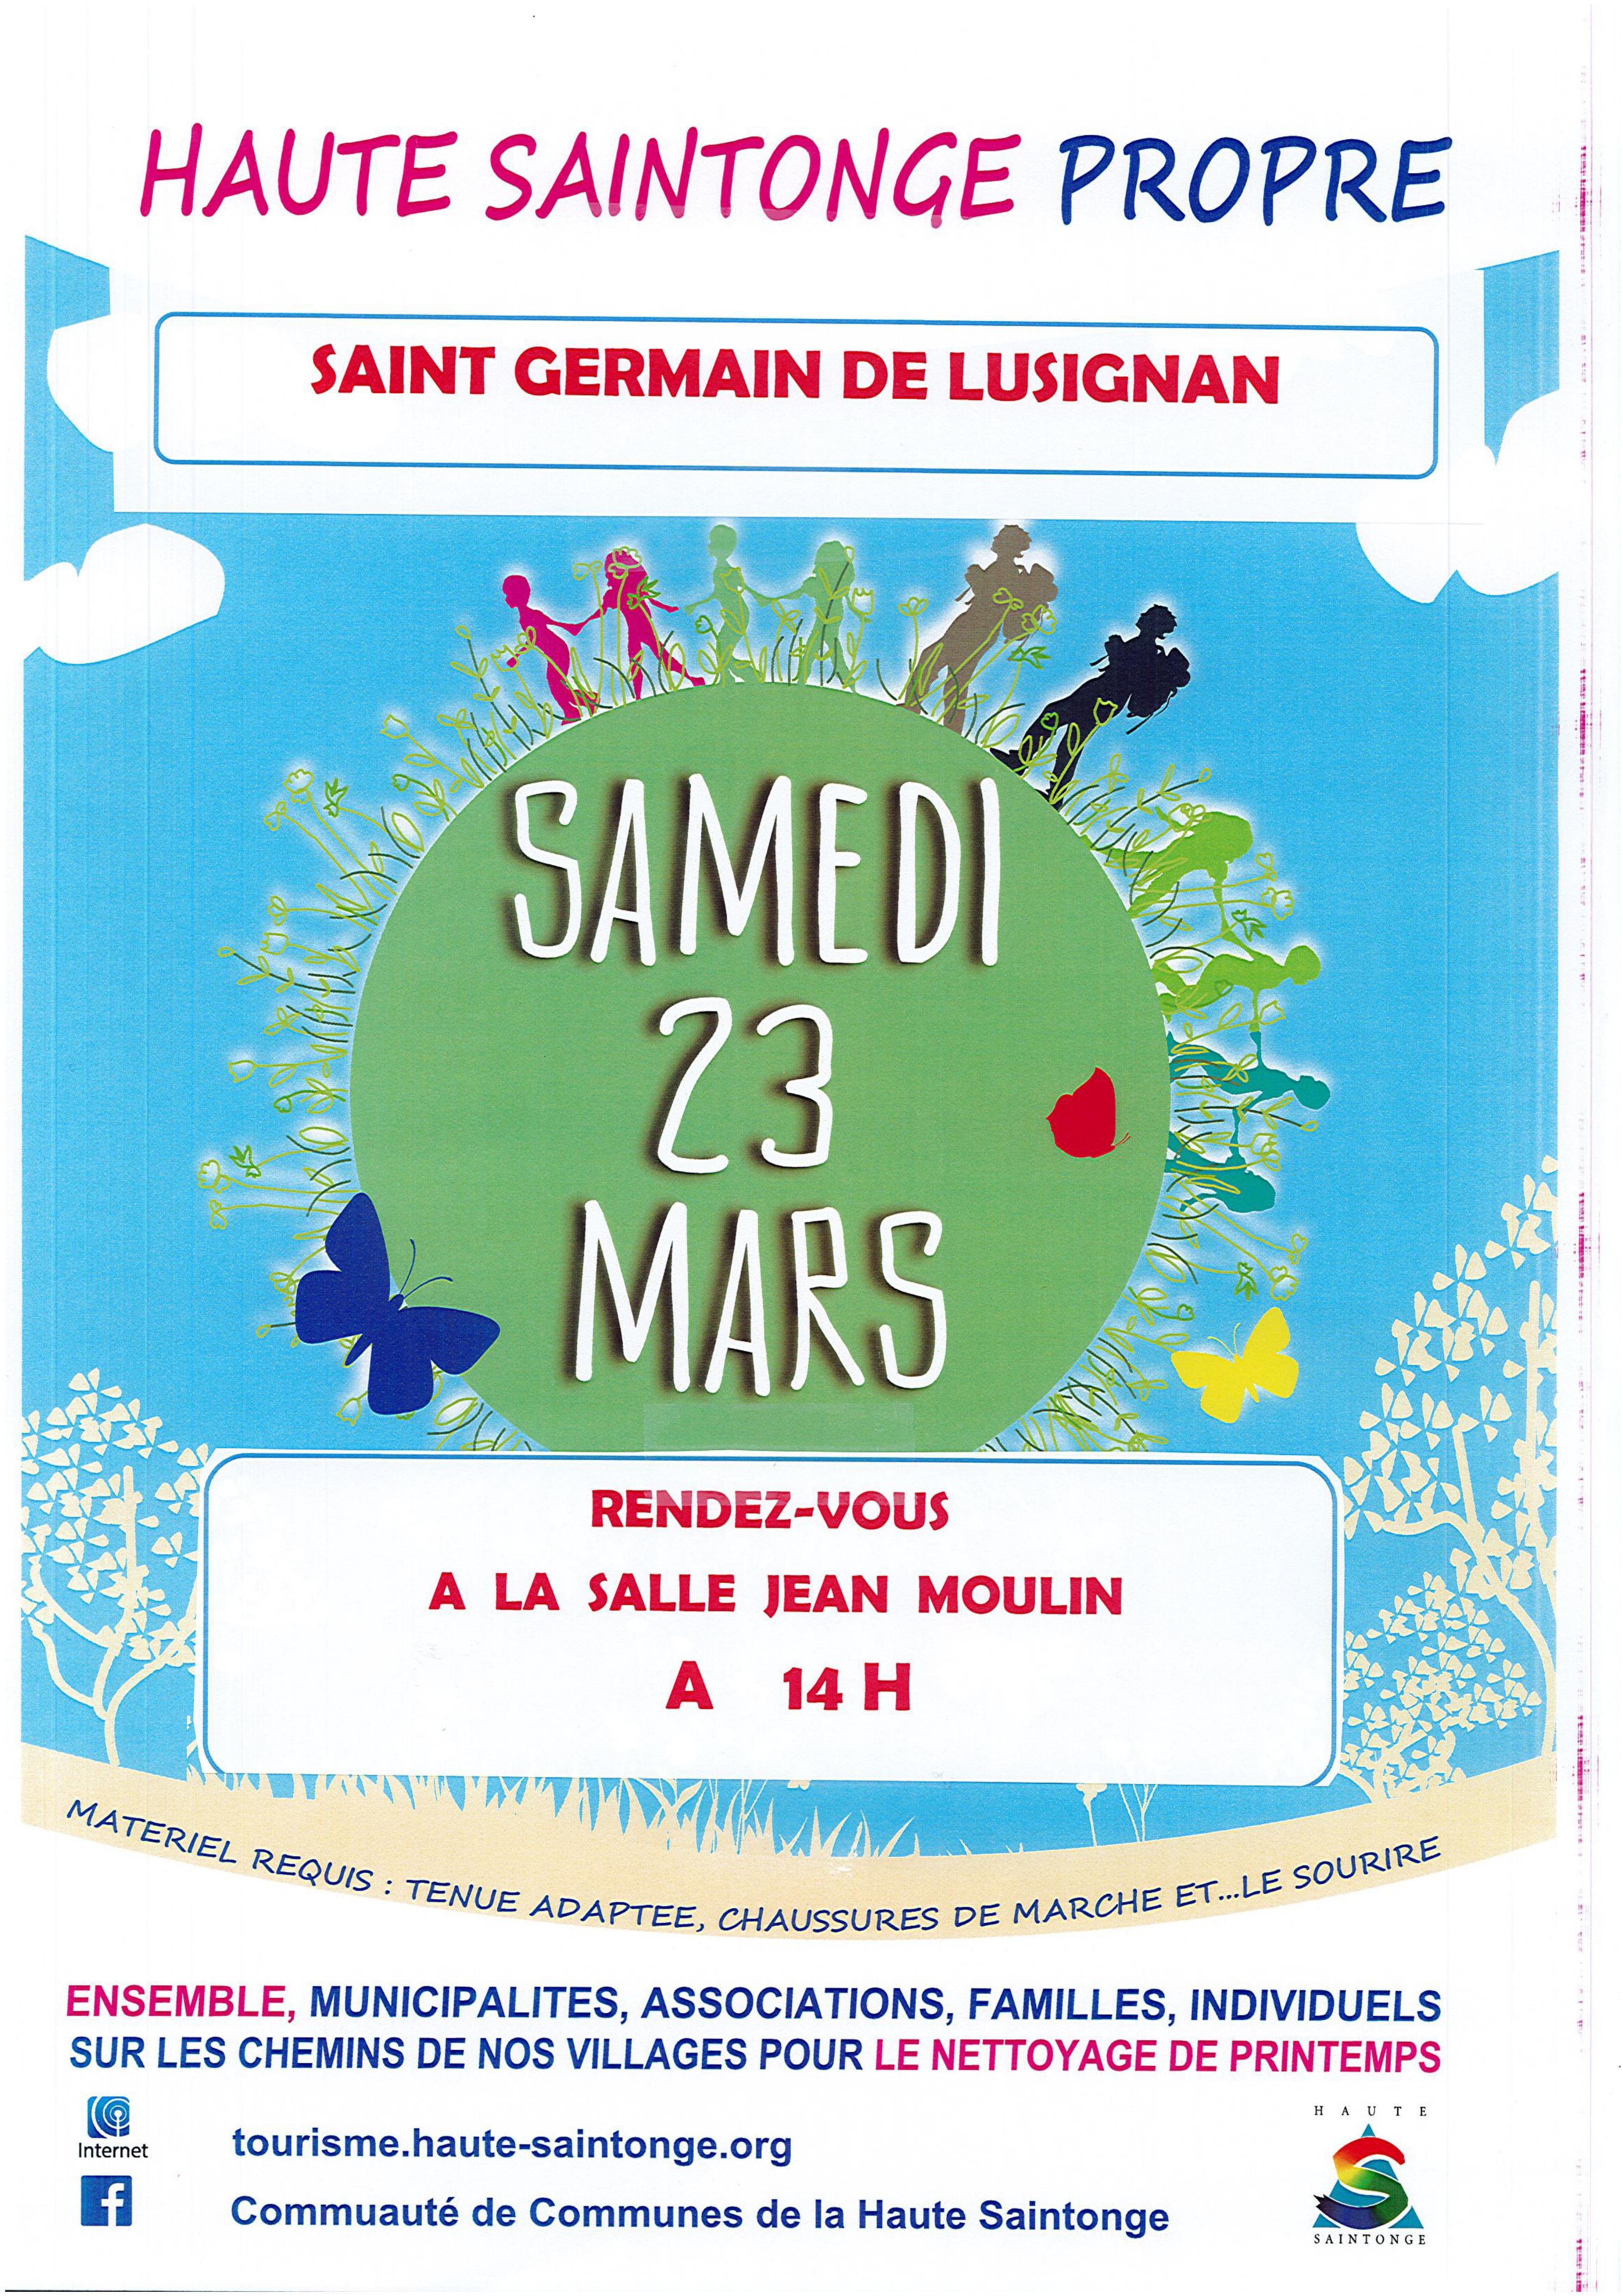 Haute Saintonge propre – 23 mars – 14h